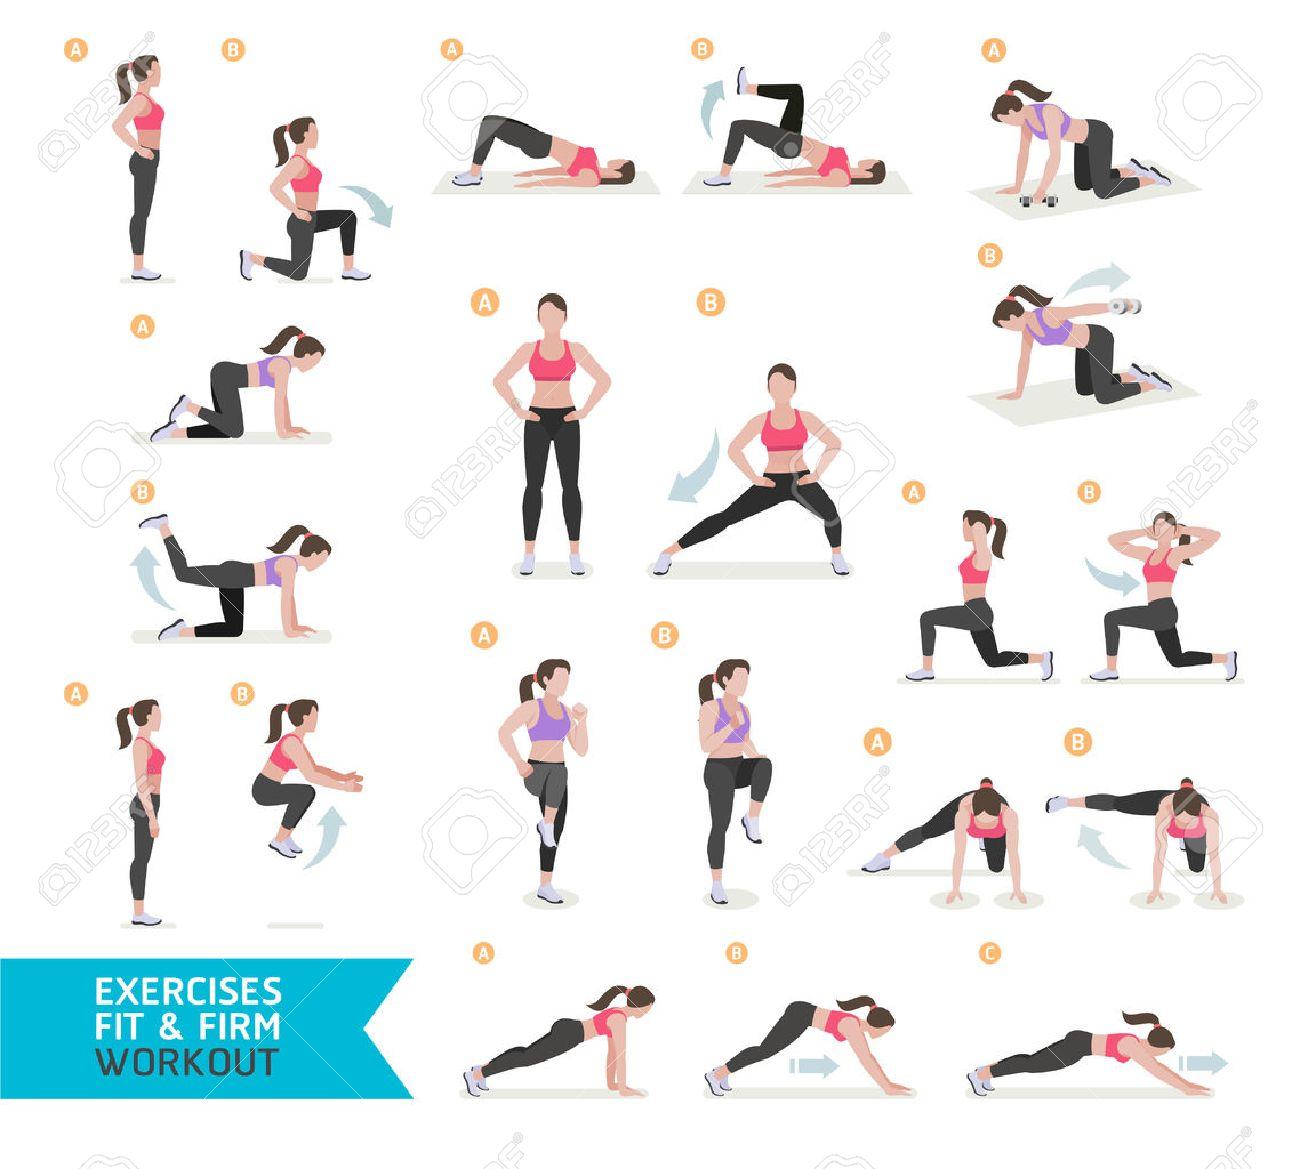 Frauen-Training Fitness, Aerobic Und Übungen. Vektor-Illustration ...